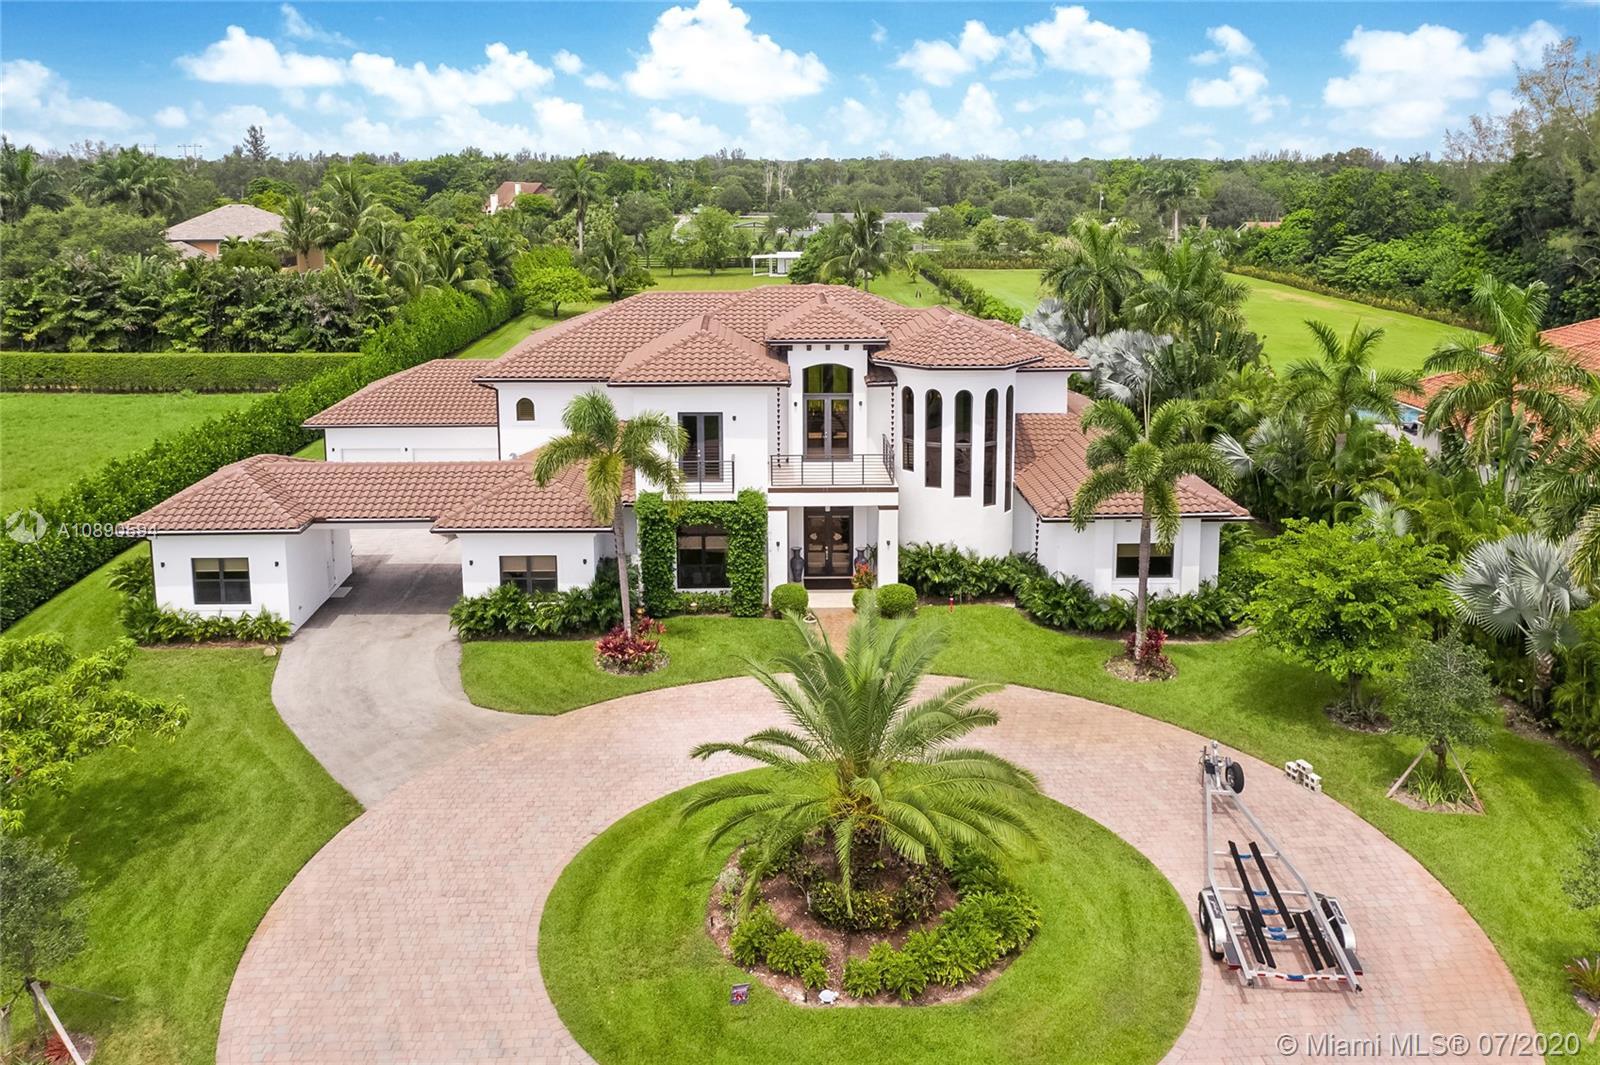 image #1 of property, Everglades Sugar Land C